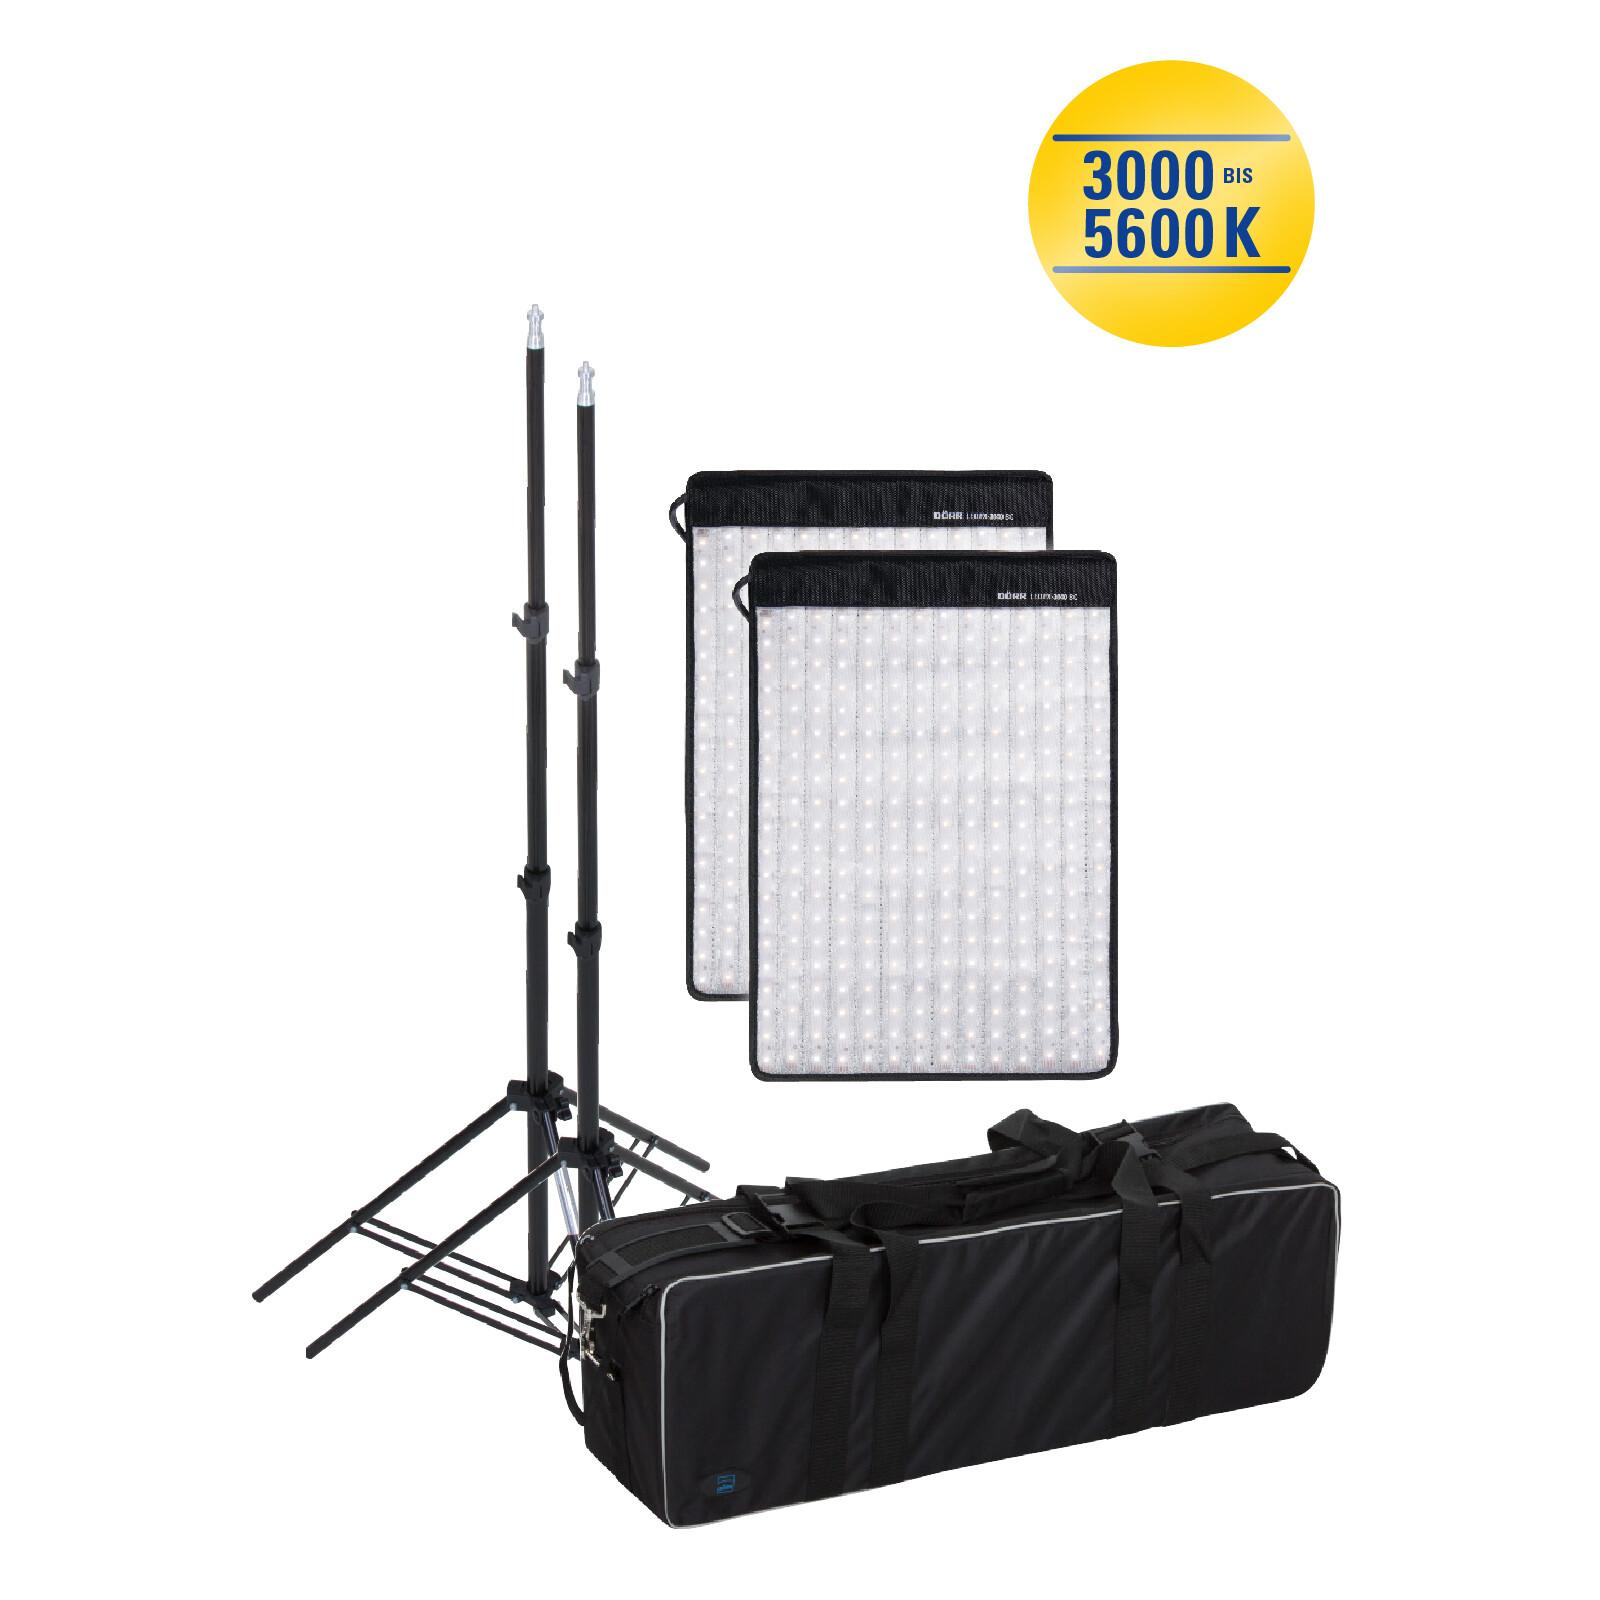 Dörr FX-3040 BC Set LED Flex Panel 2er-Set inkl. Leuchtensta